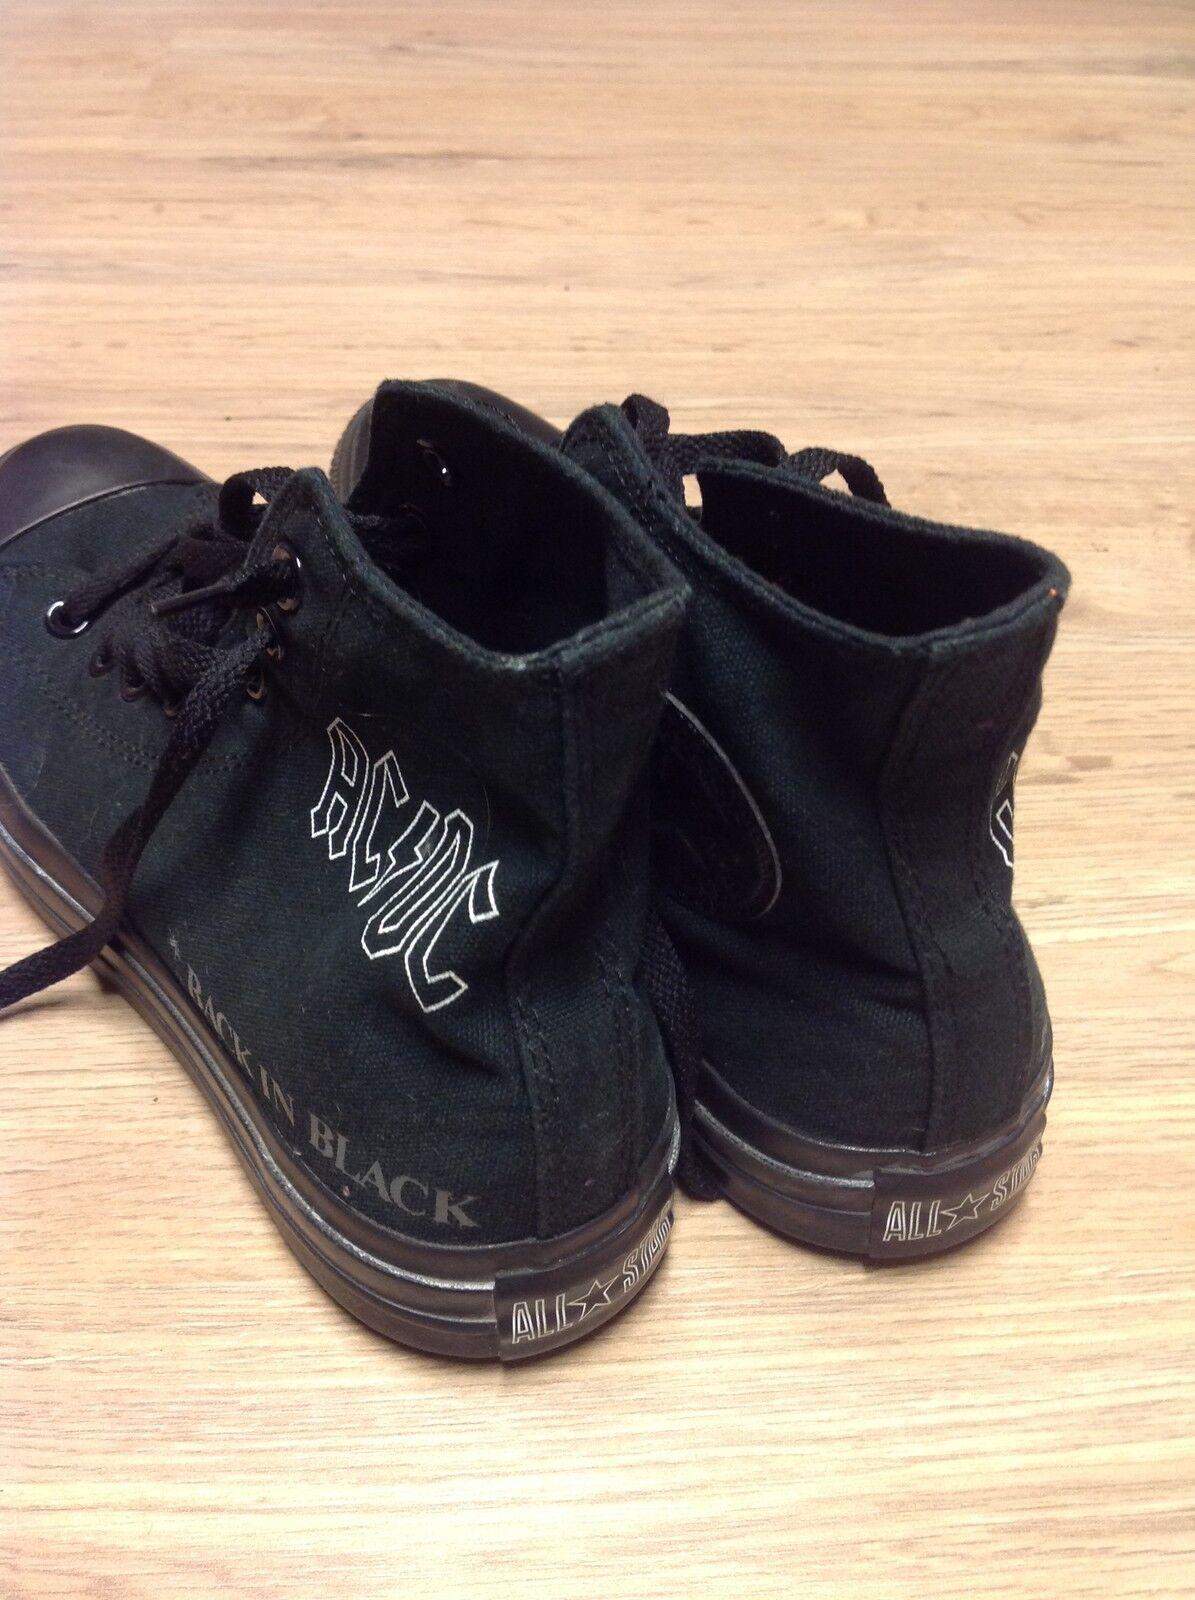 converse chucks ALL STAR AC/DC back in black schwarz LIMITED LIMITED LIMITED ED  mehrere grössen f4a4d3